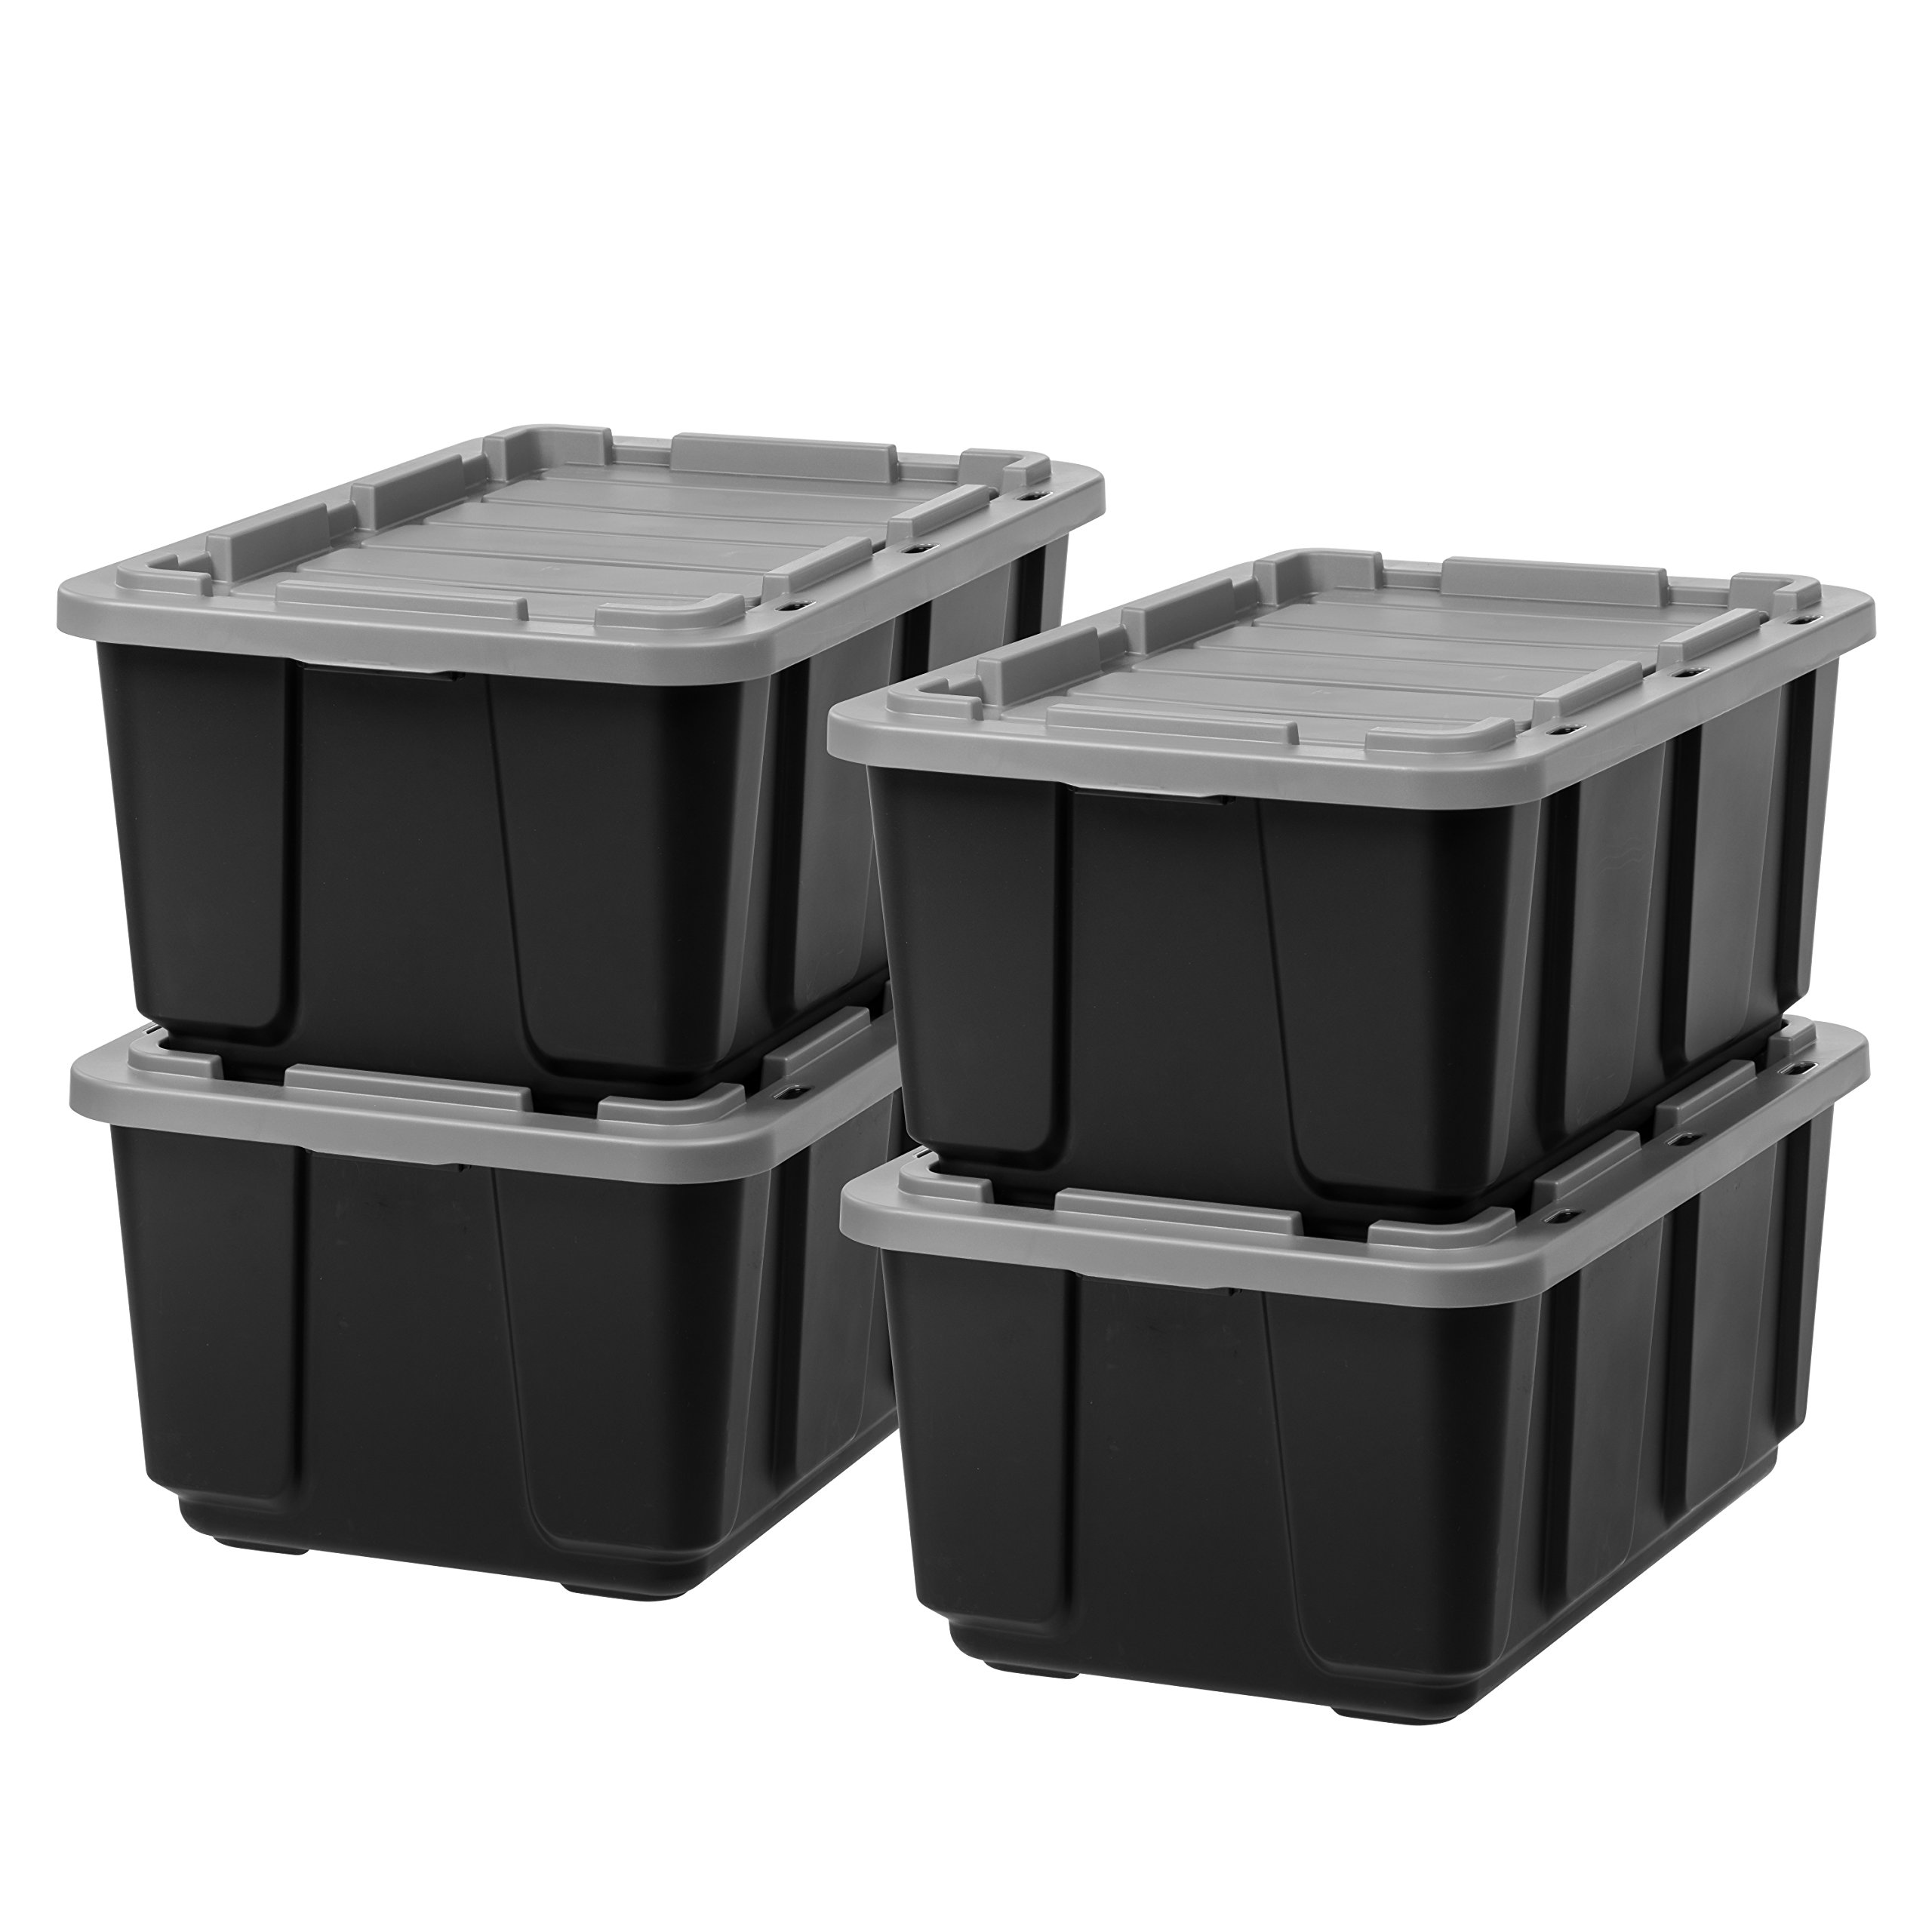 IRIS 27 Gallon Utility Tough Tote, 4 Pack, Black with Gray Lid by IRIS USA, Inc.